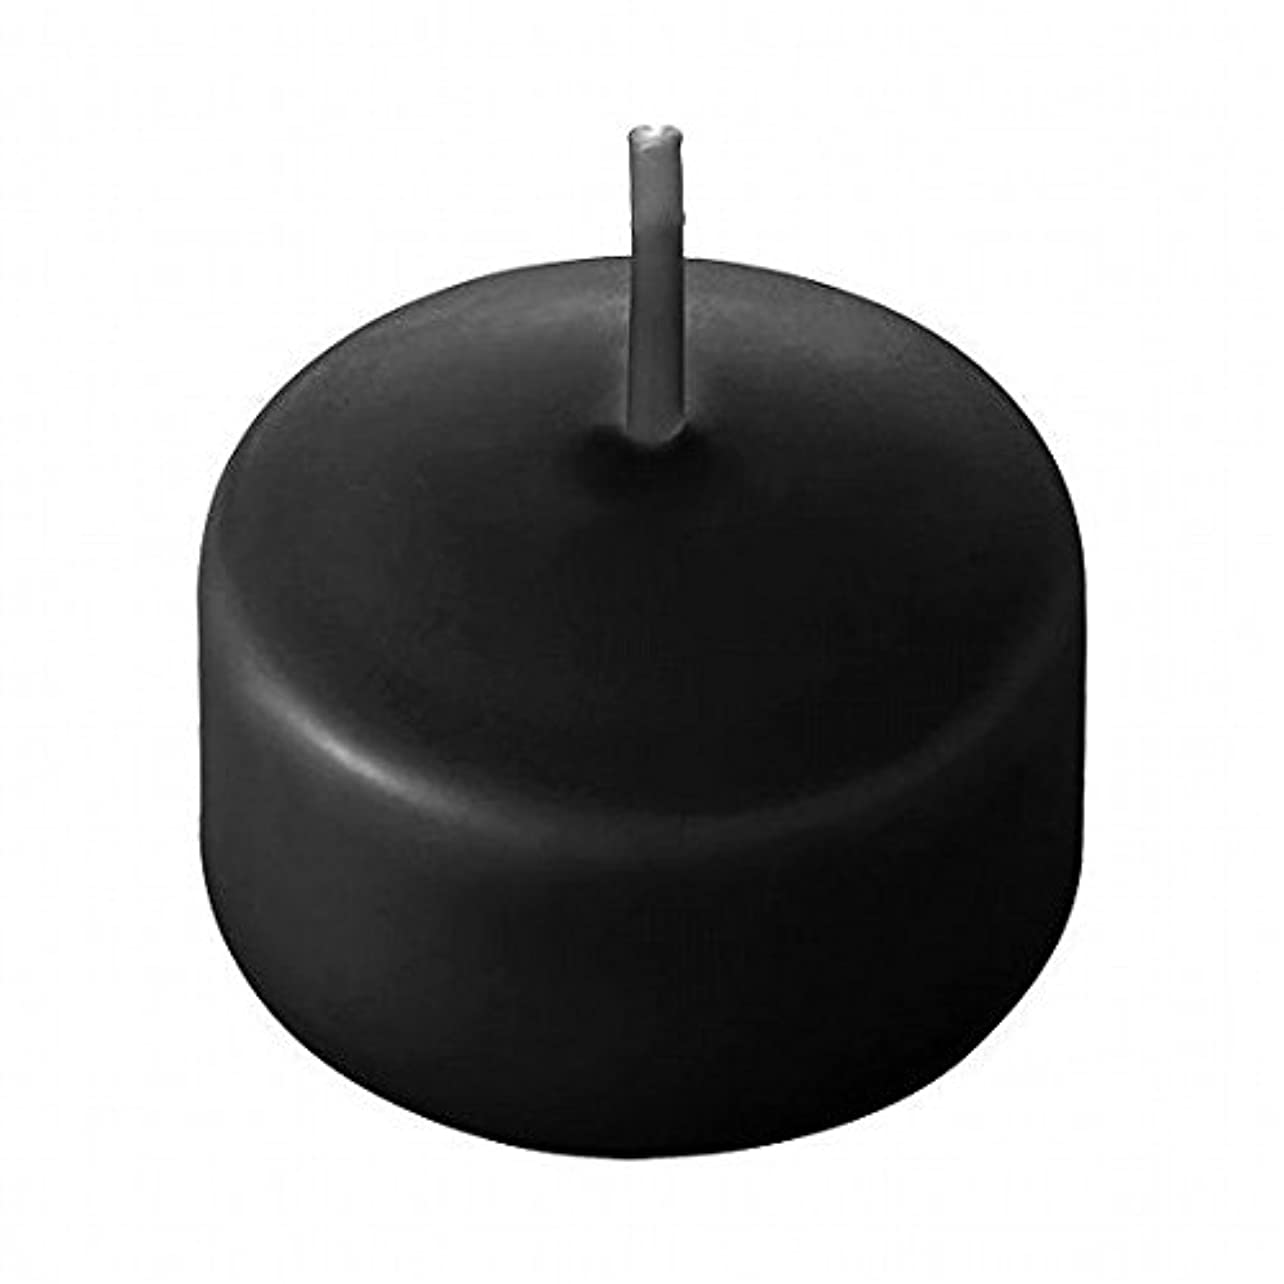 kameyama candle(カメヤマキャンドル) キャンドル ハッピープール(カラーアトリエ) 「 ブラック 」 24個入り キャンドル (72800000BK)